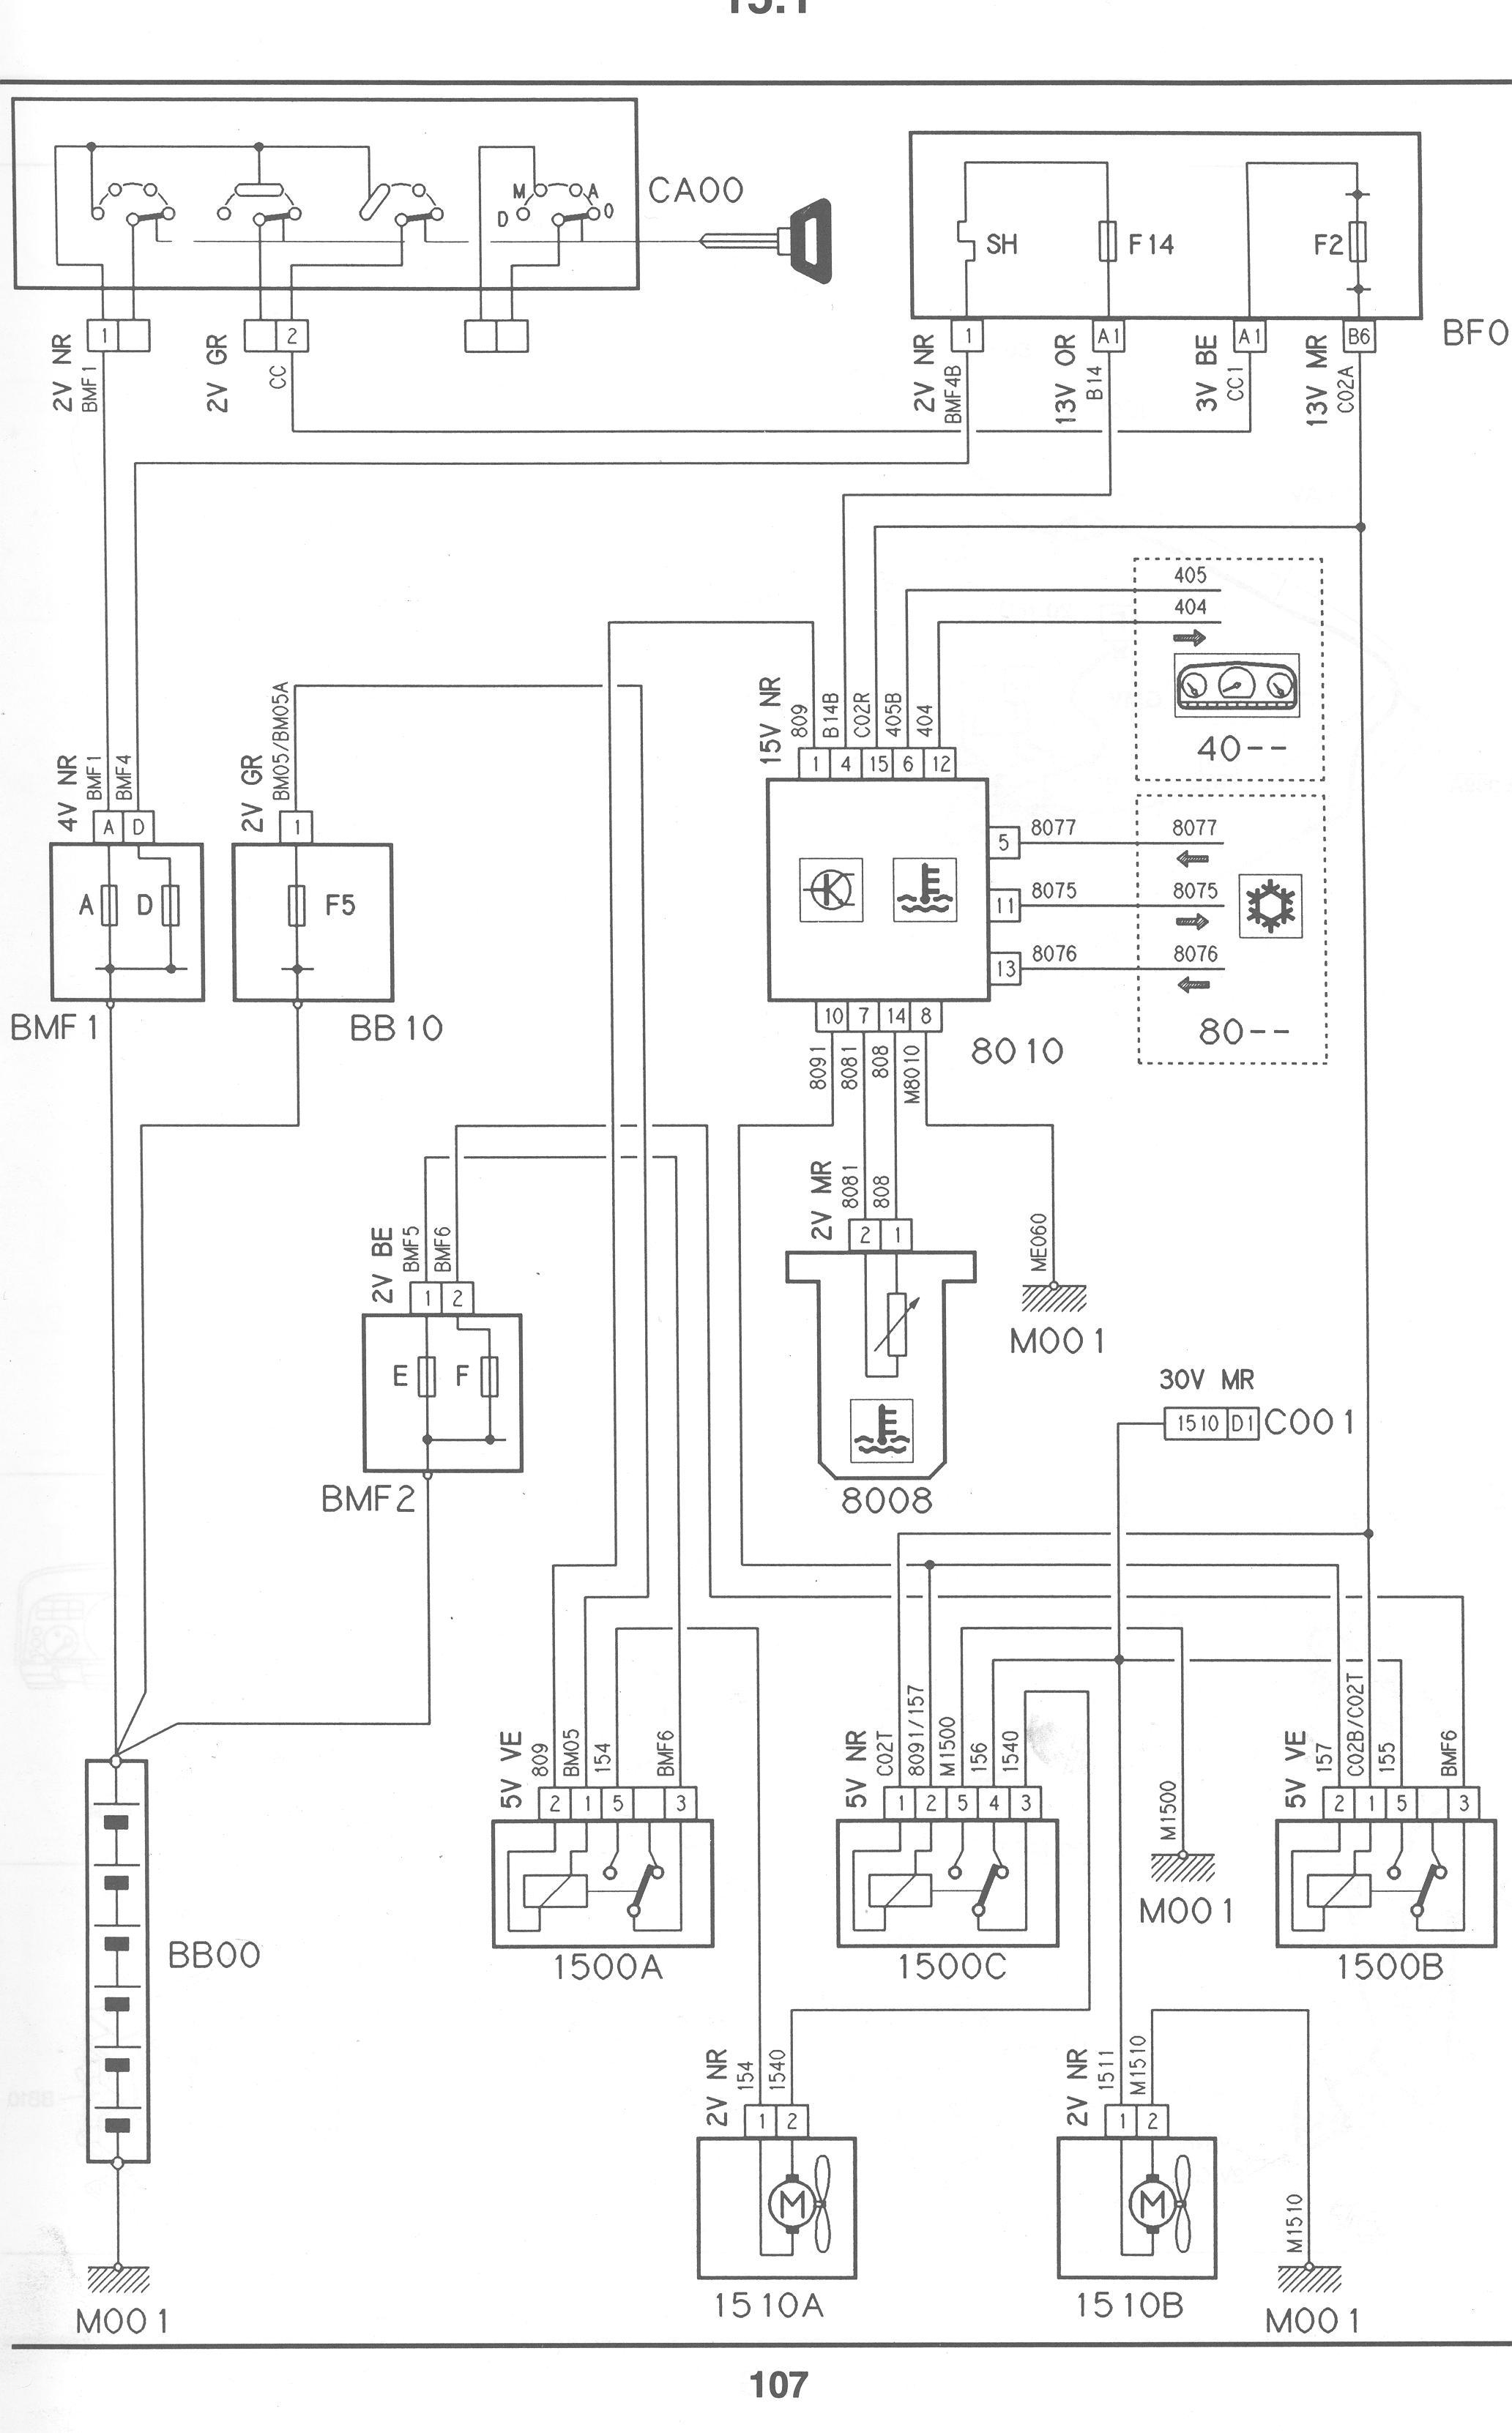 Citroen Ax Wiring Diagram Schemes. Citroen. Auto Wiring